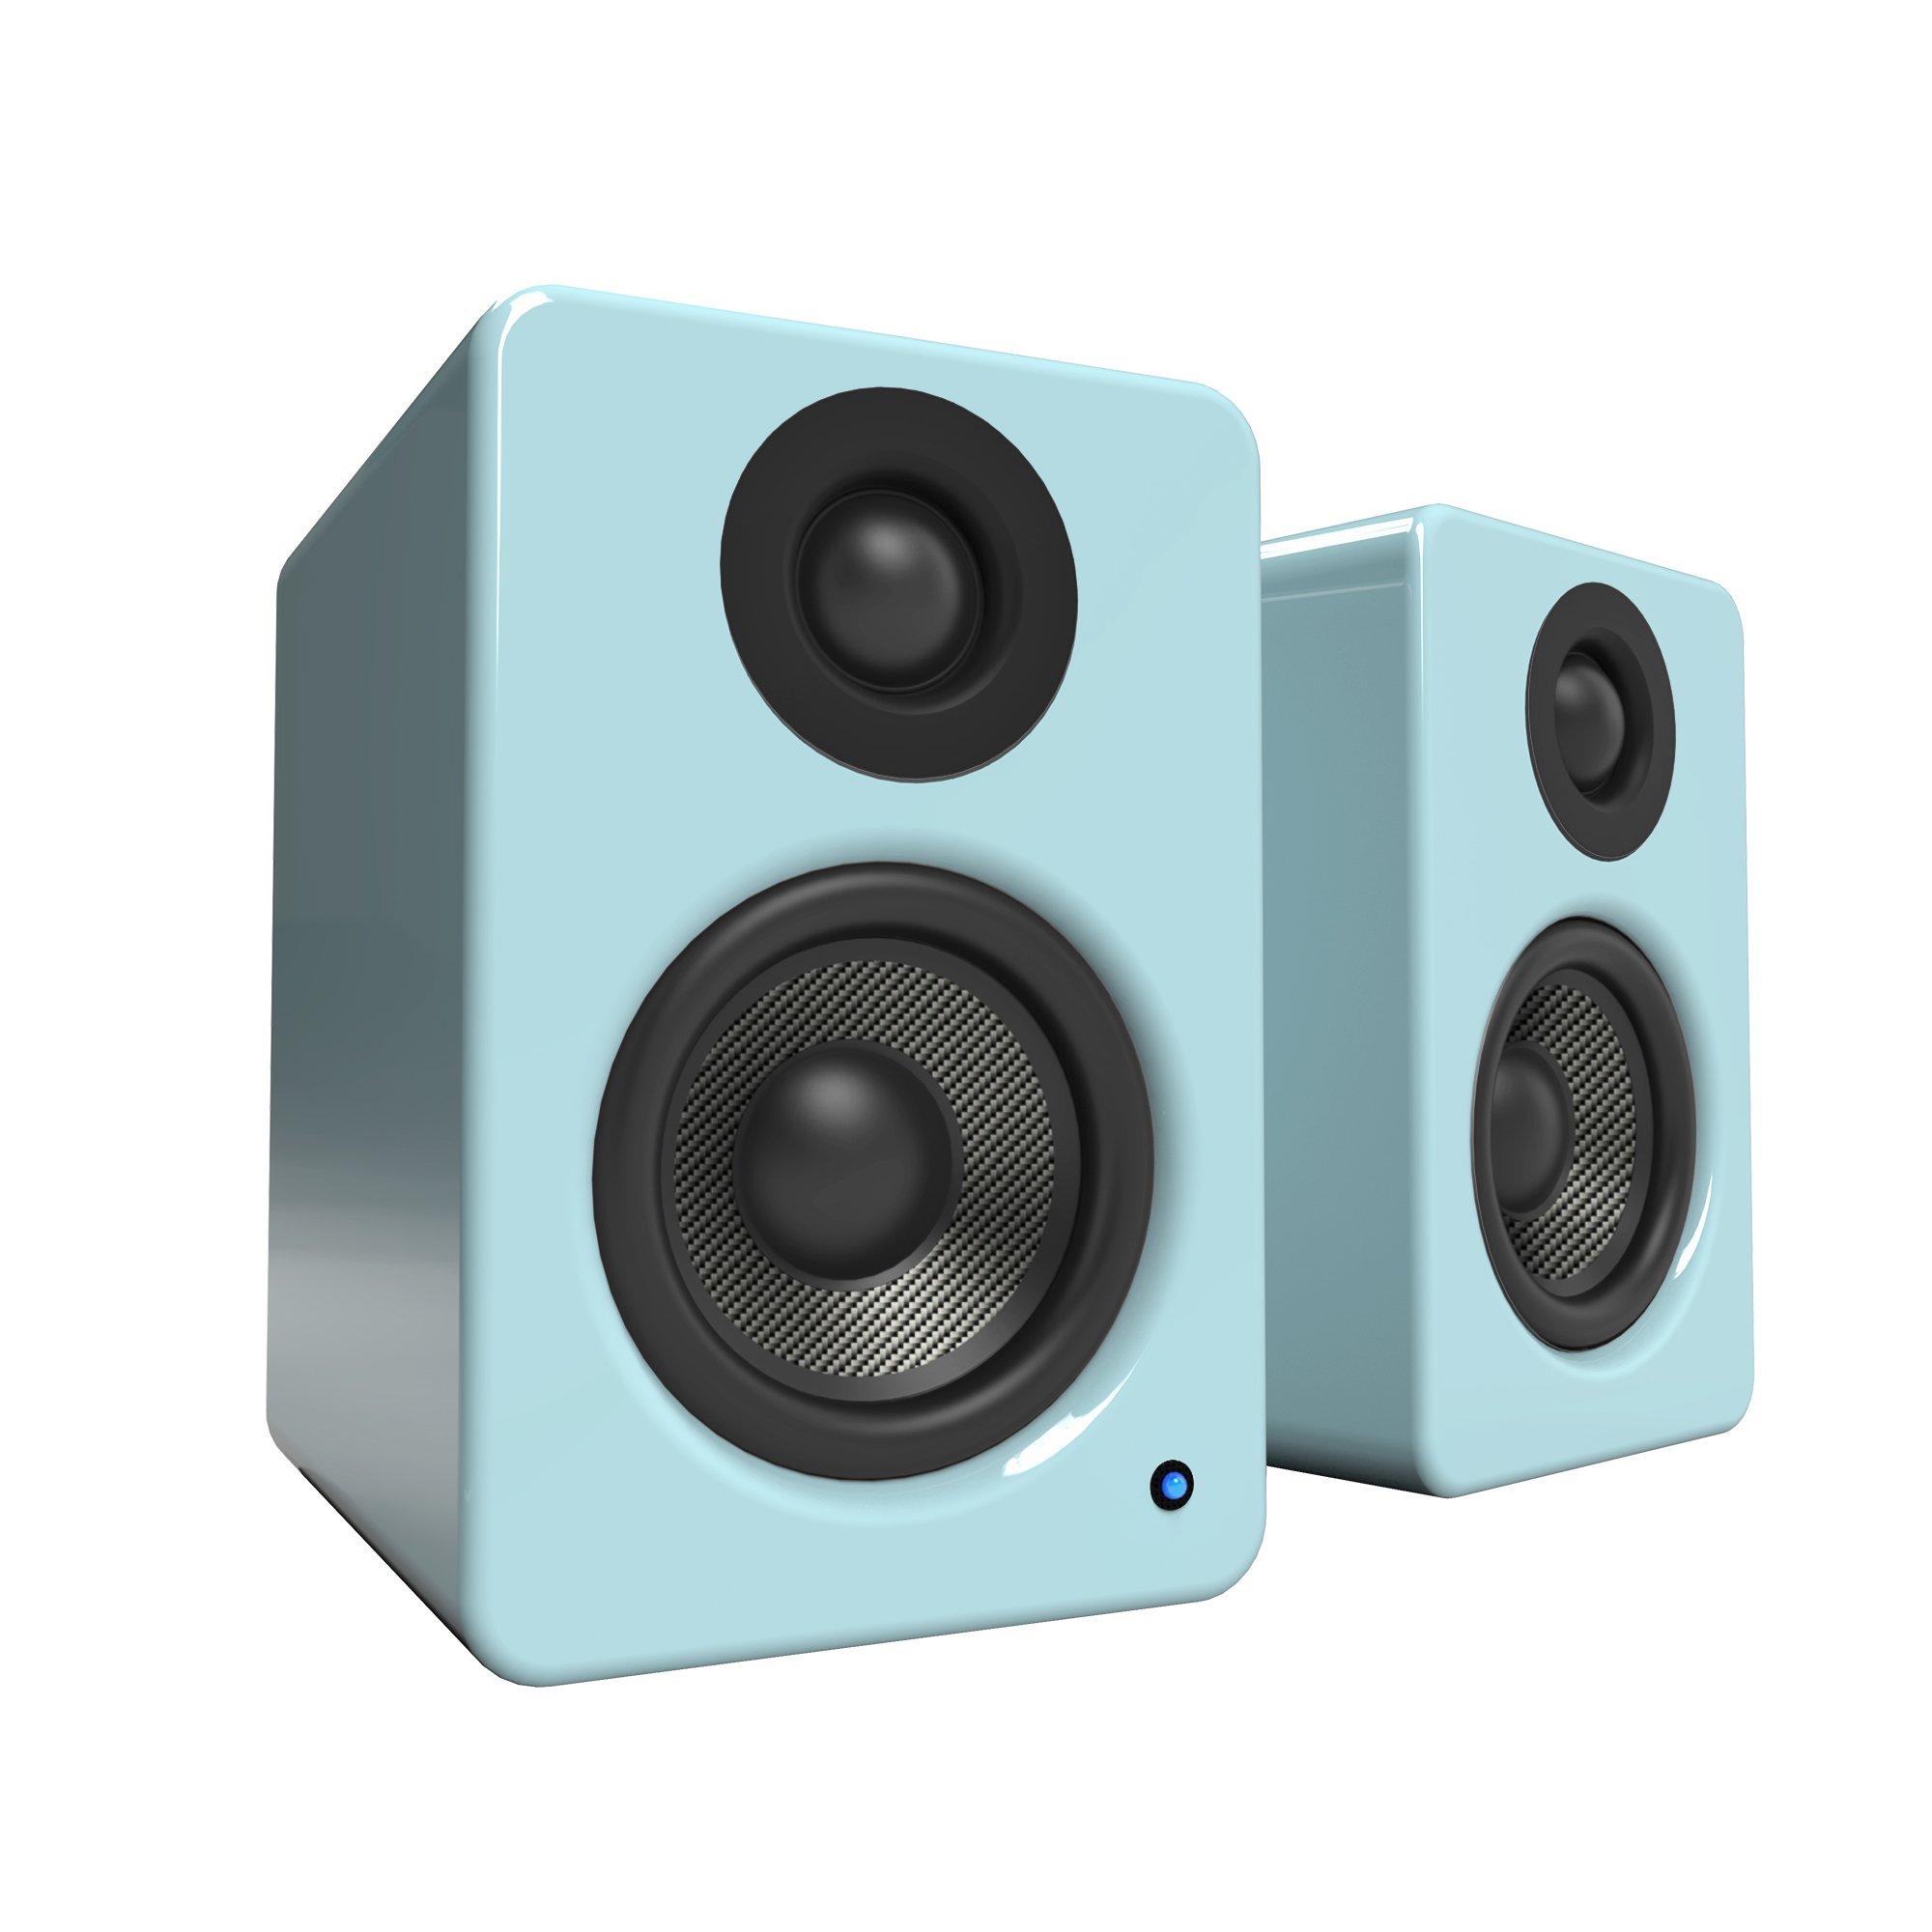 Kanto YU2 Powered Desktop Speakers – 3'' Composite Driver 3/4'' Silk Dome Tweeter – Gloss Teal